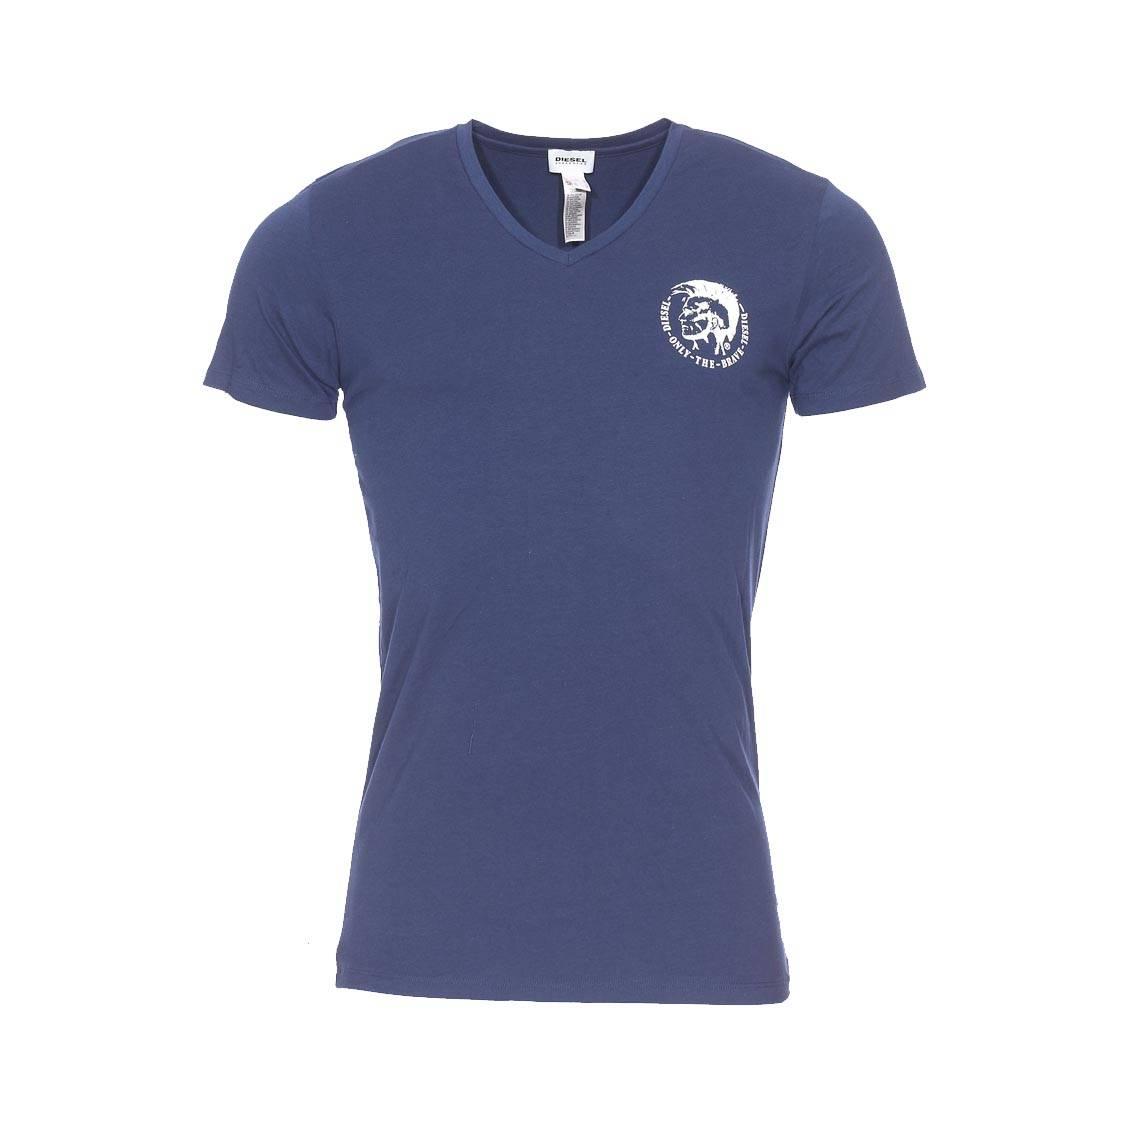 Tee-shirt col v diesel en coton stretch bleu marine